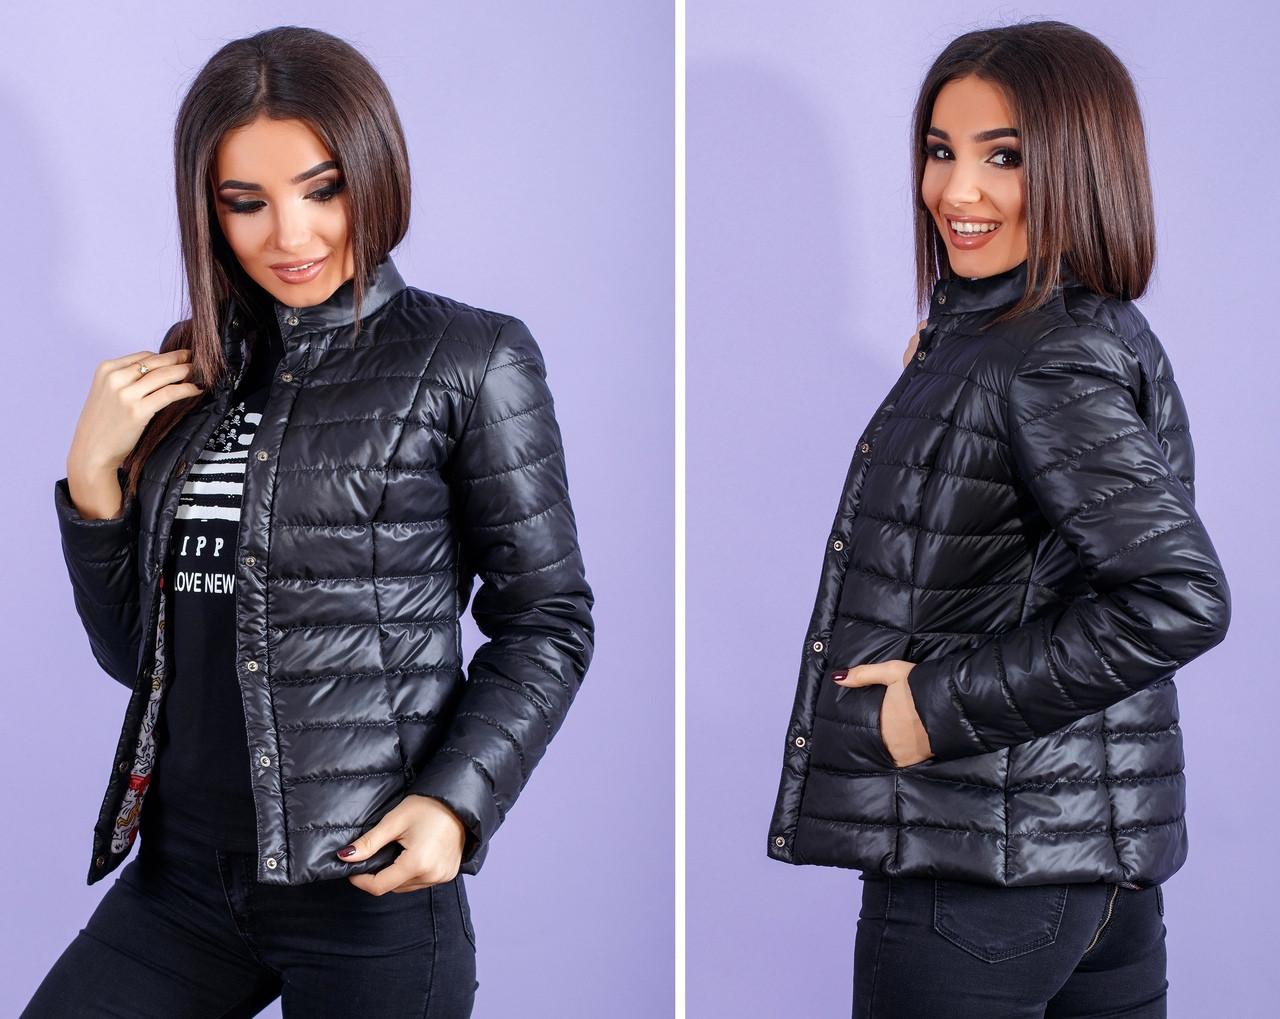 Женская куртка на синтепоне (норма и полубатал)